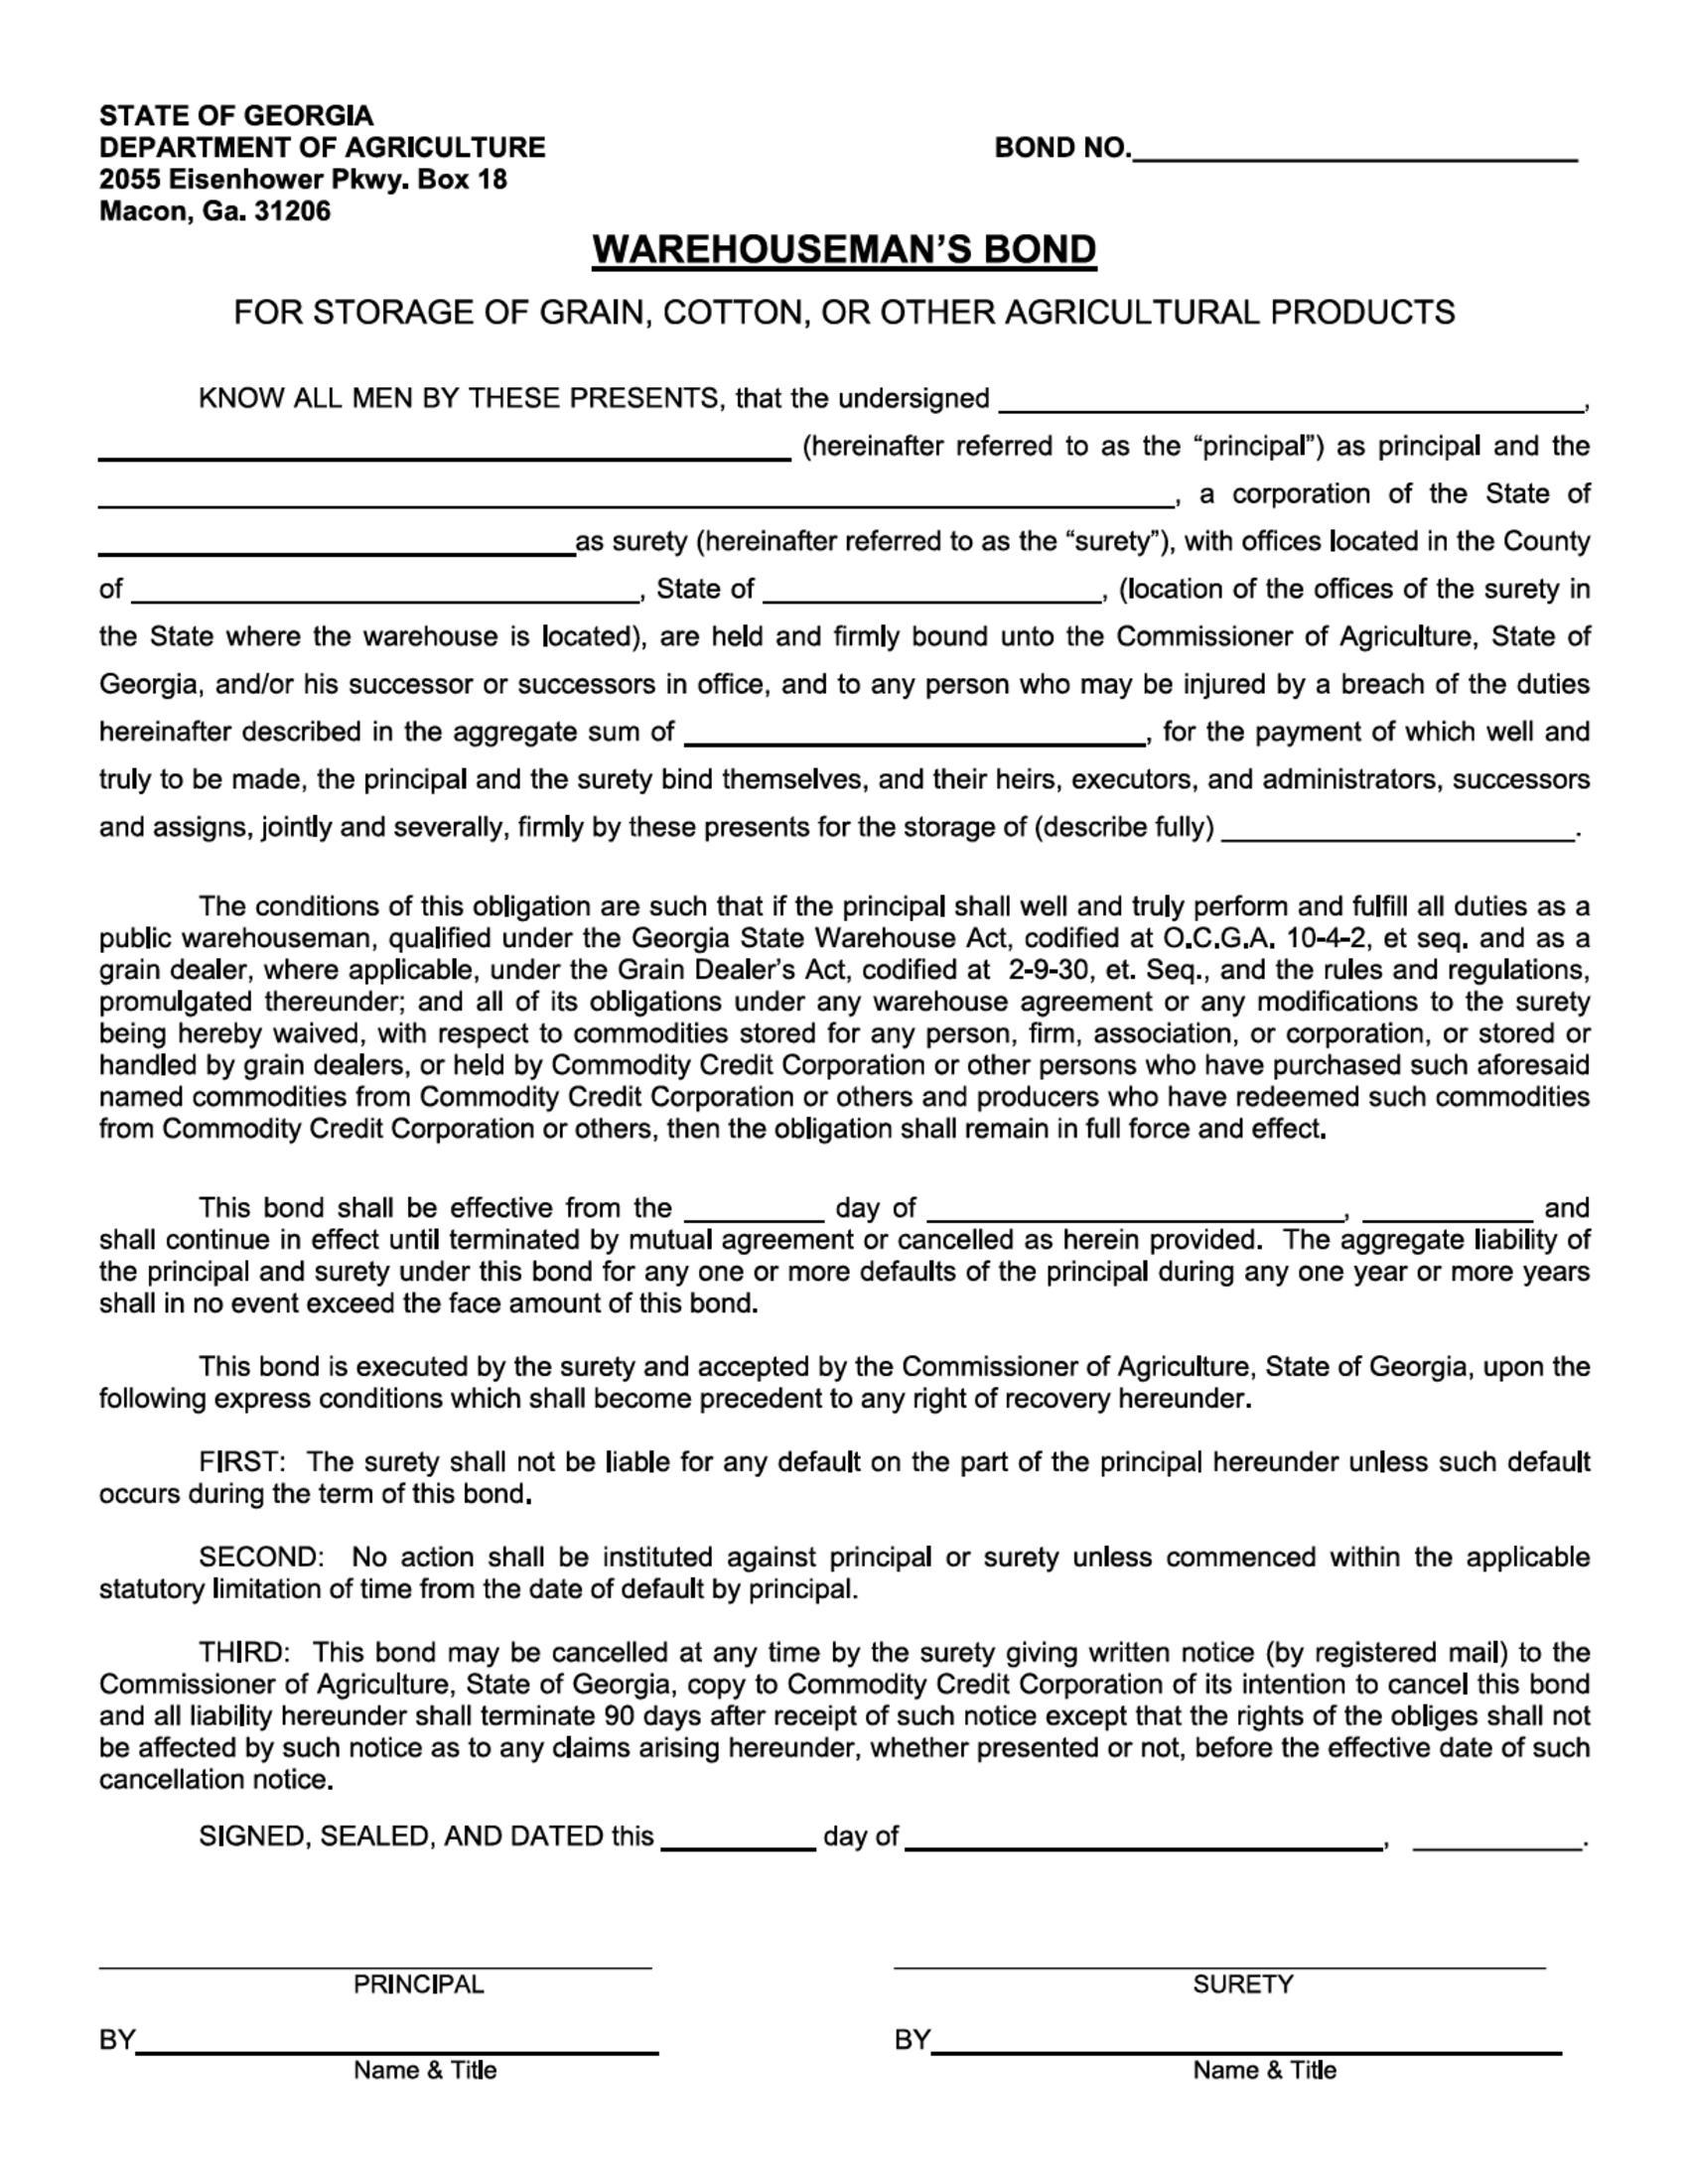 Georgia Commisioner of Agriculture Warehouseman Bond sample image